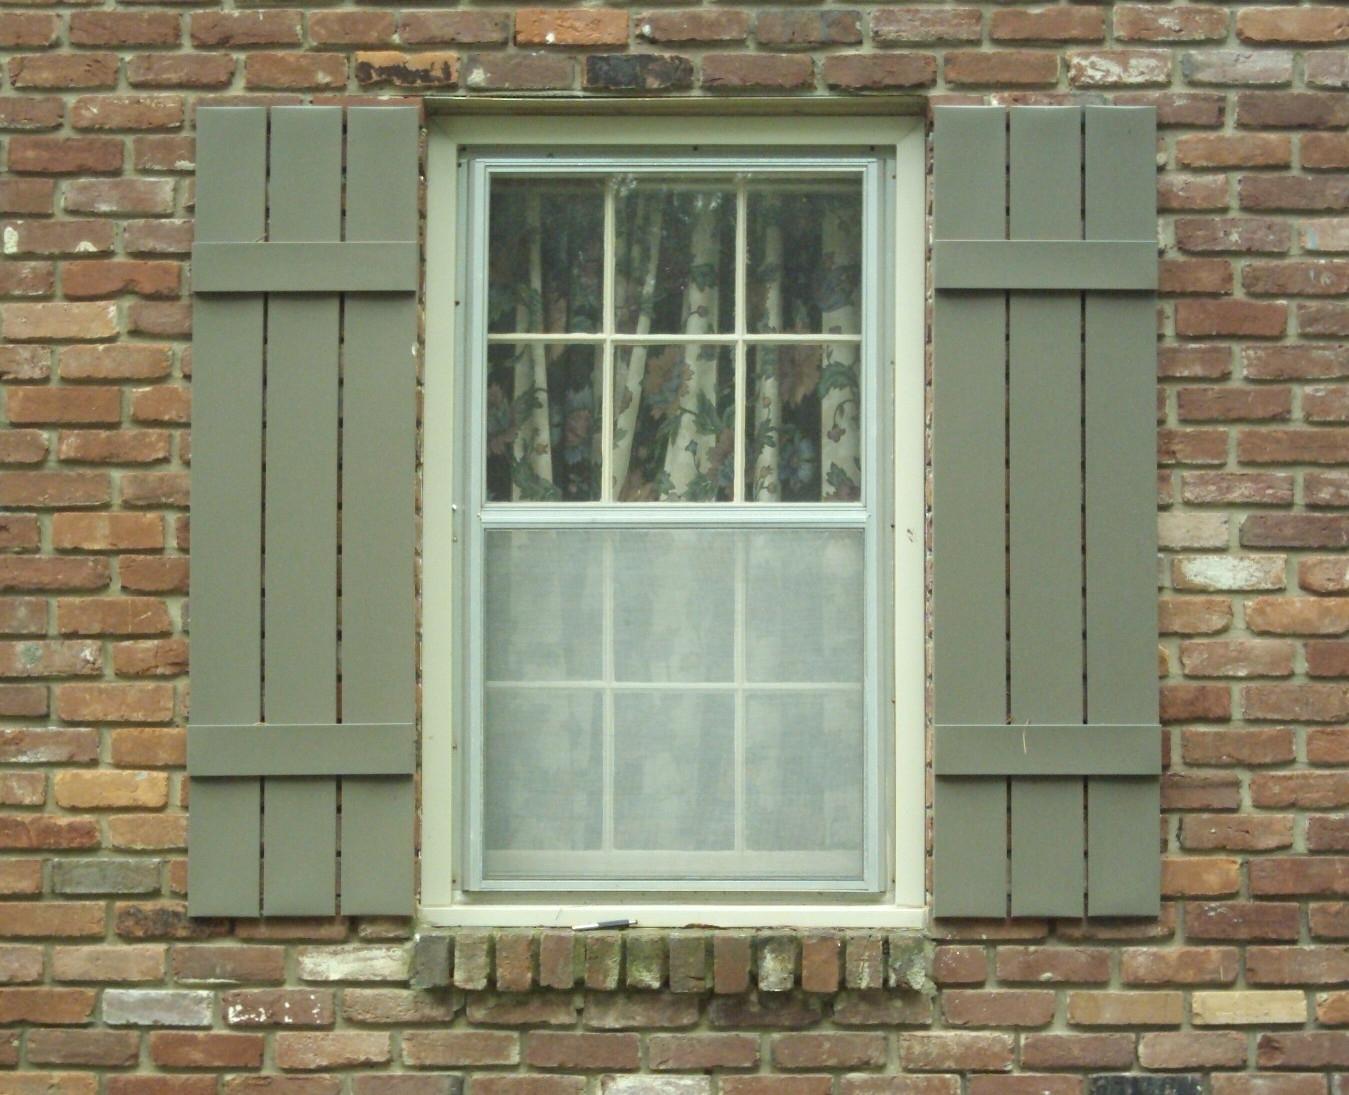 Exterior Shutters For Windows Decorative Madison Art